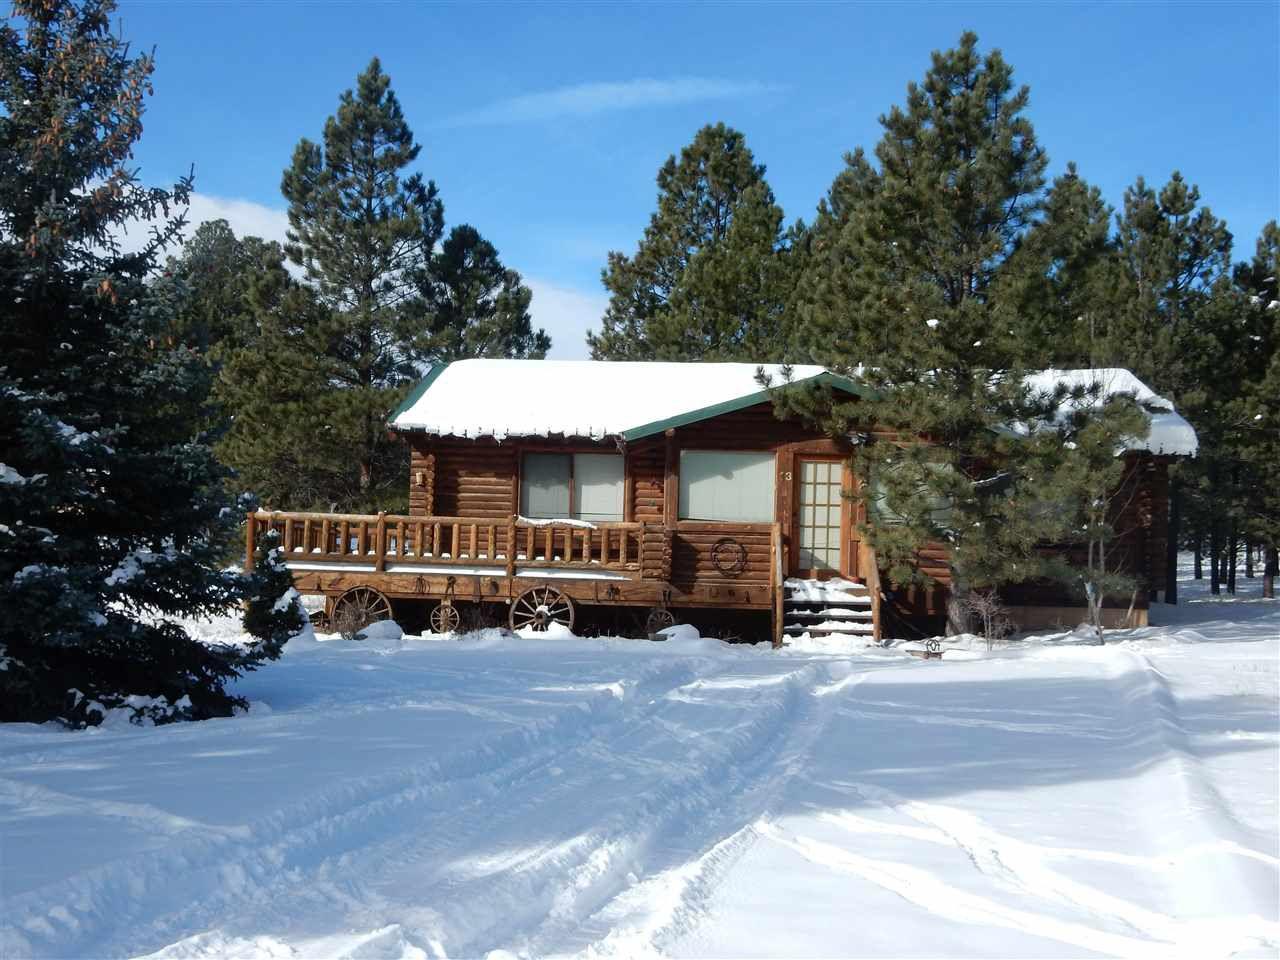 cabins bedroom fire angel cabin ang between mountain luxury vrbo